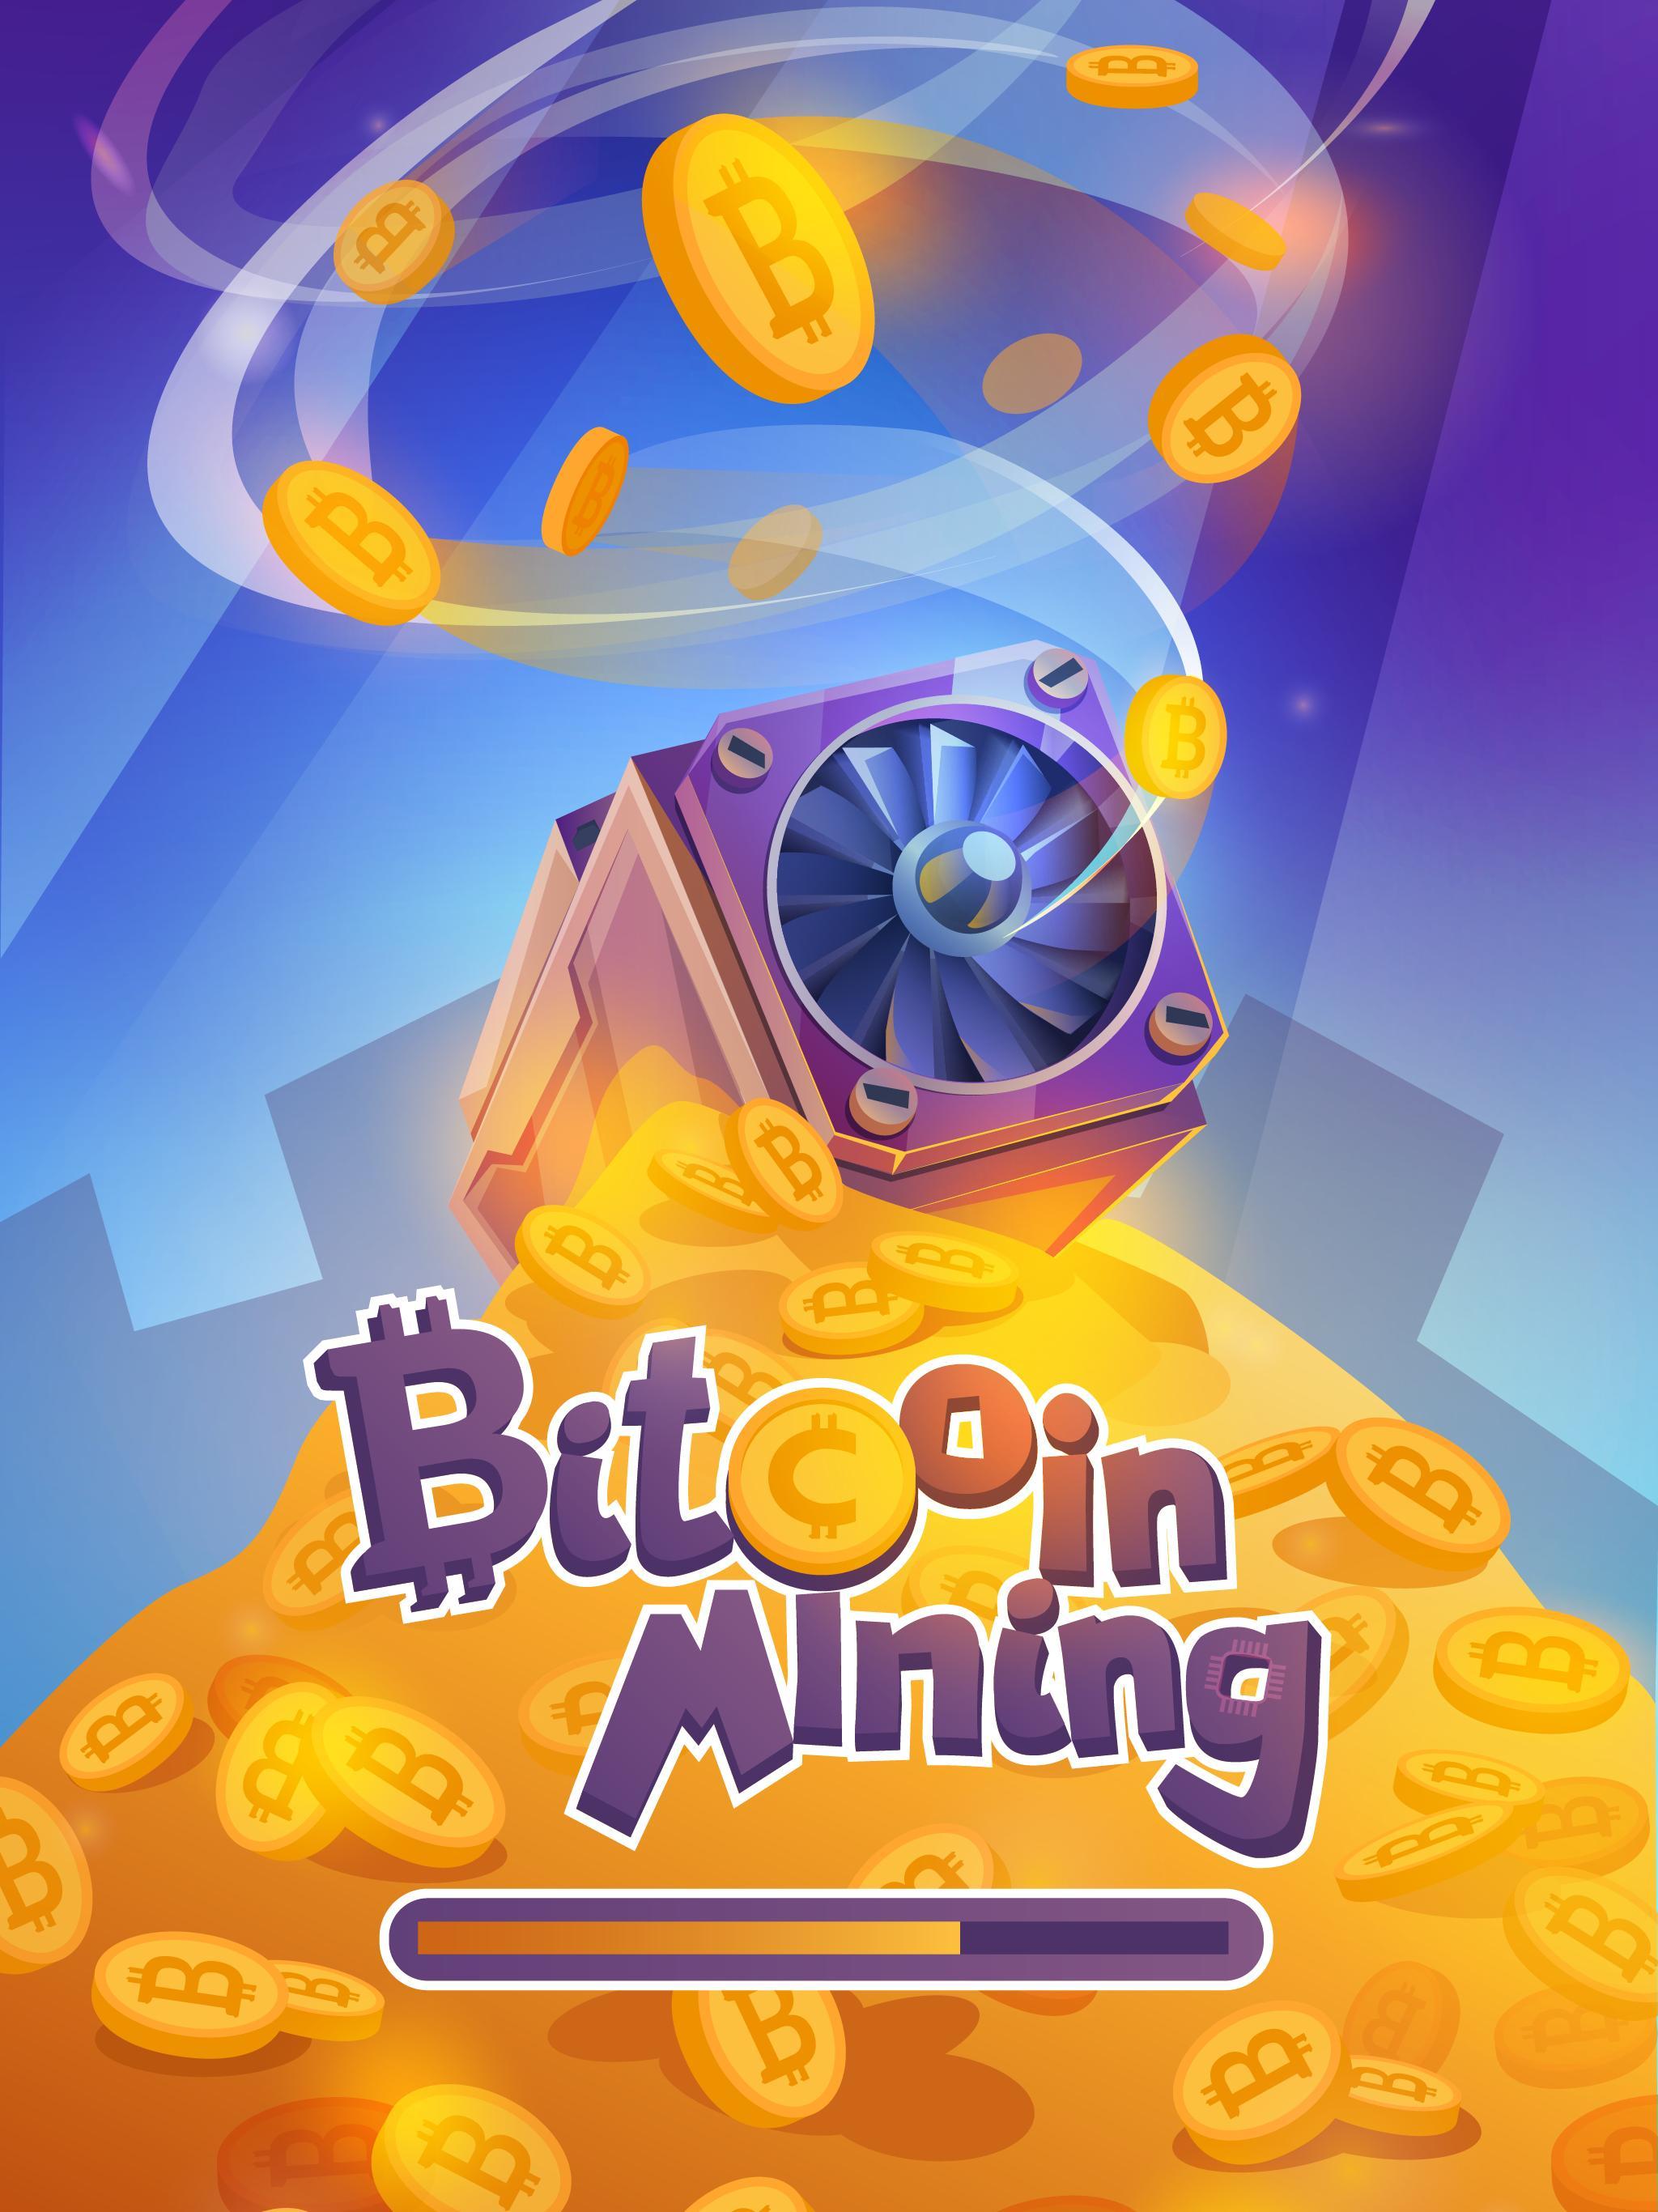 Bitcoins mining android emulator kleinbettingen luxembourg wedding